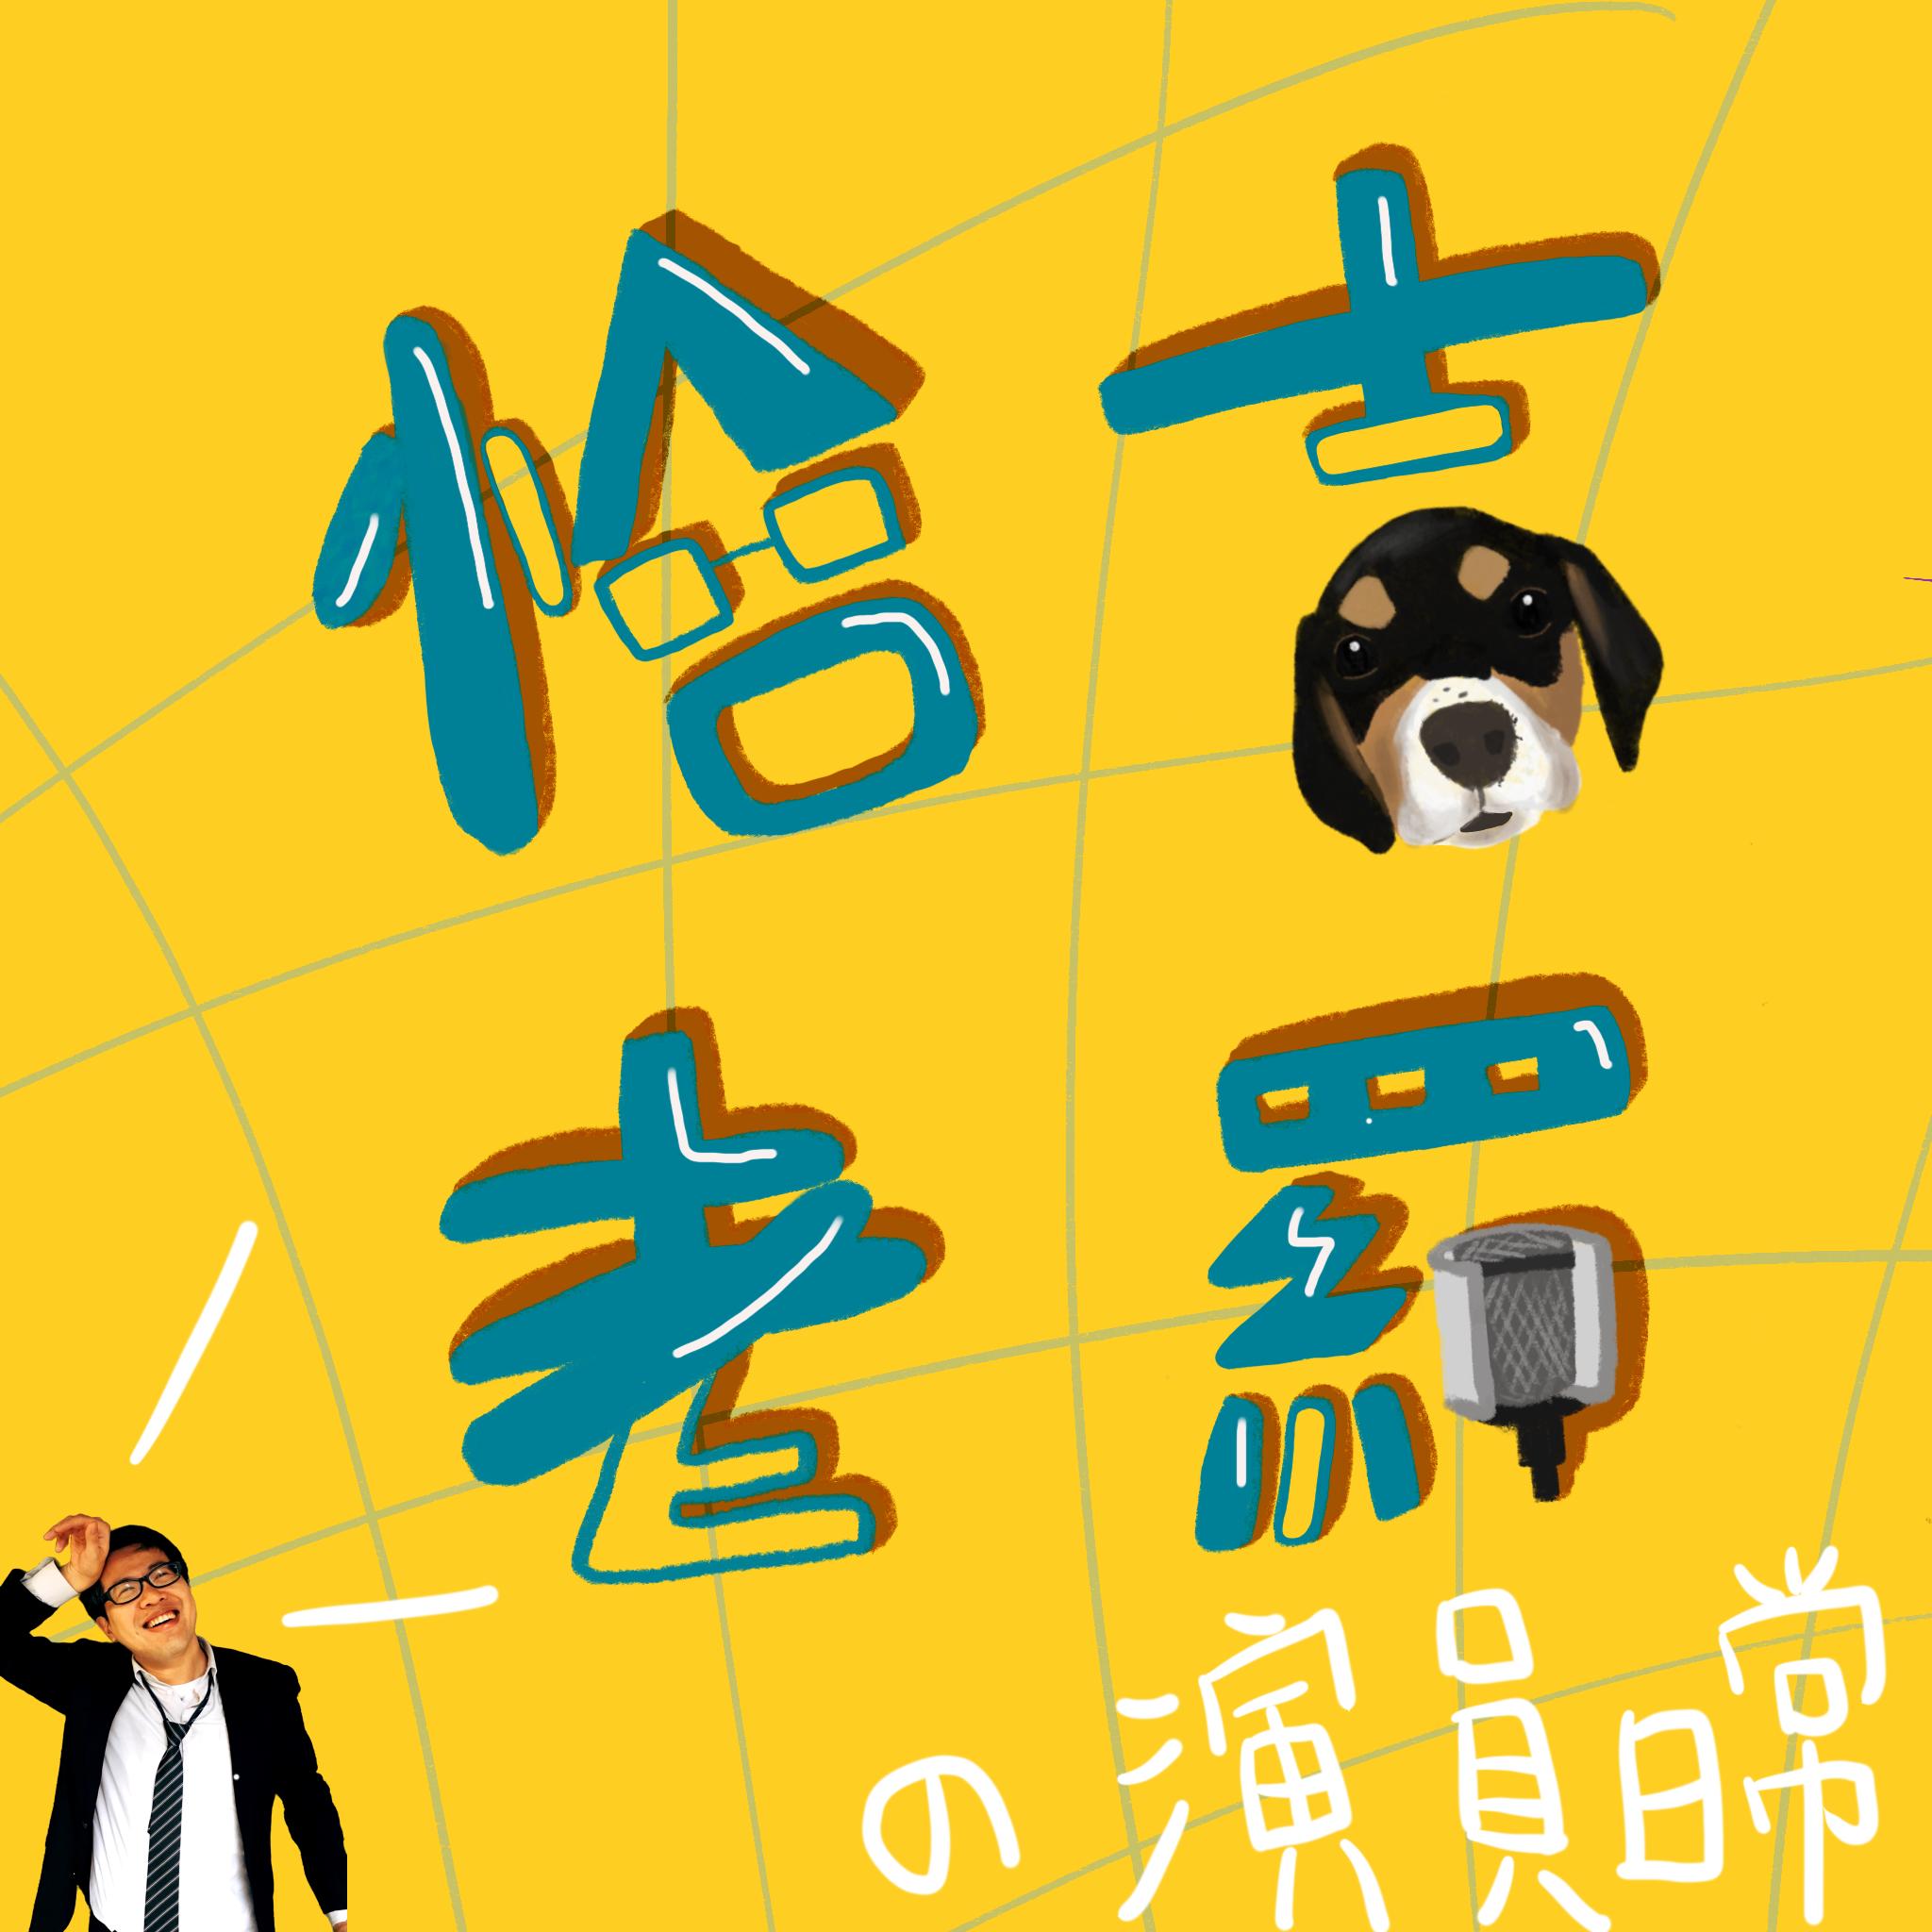 E43-濕濕知識型播客來踢館 feat.藥理詩詩 (清晰正確版)